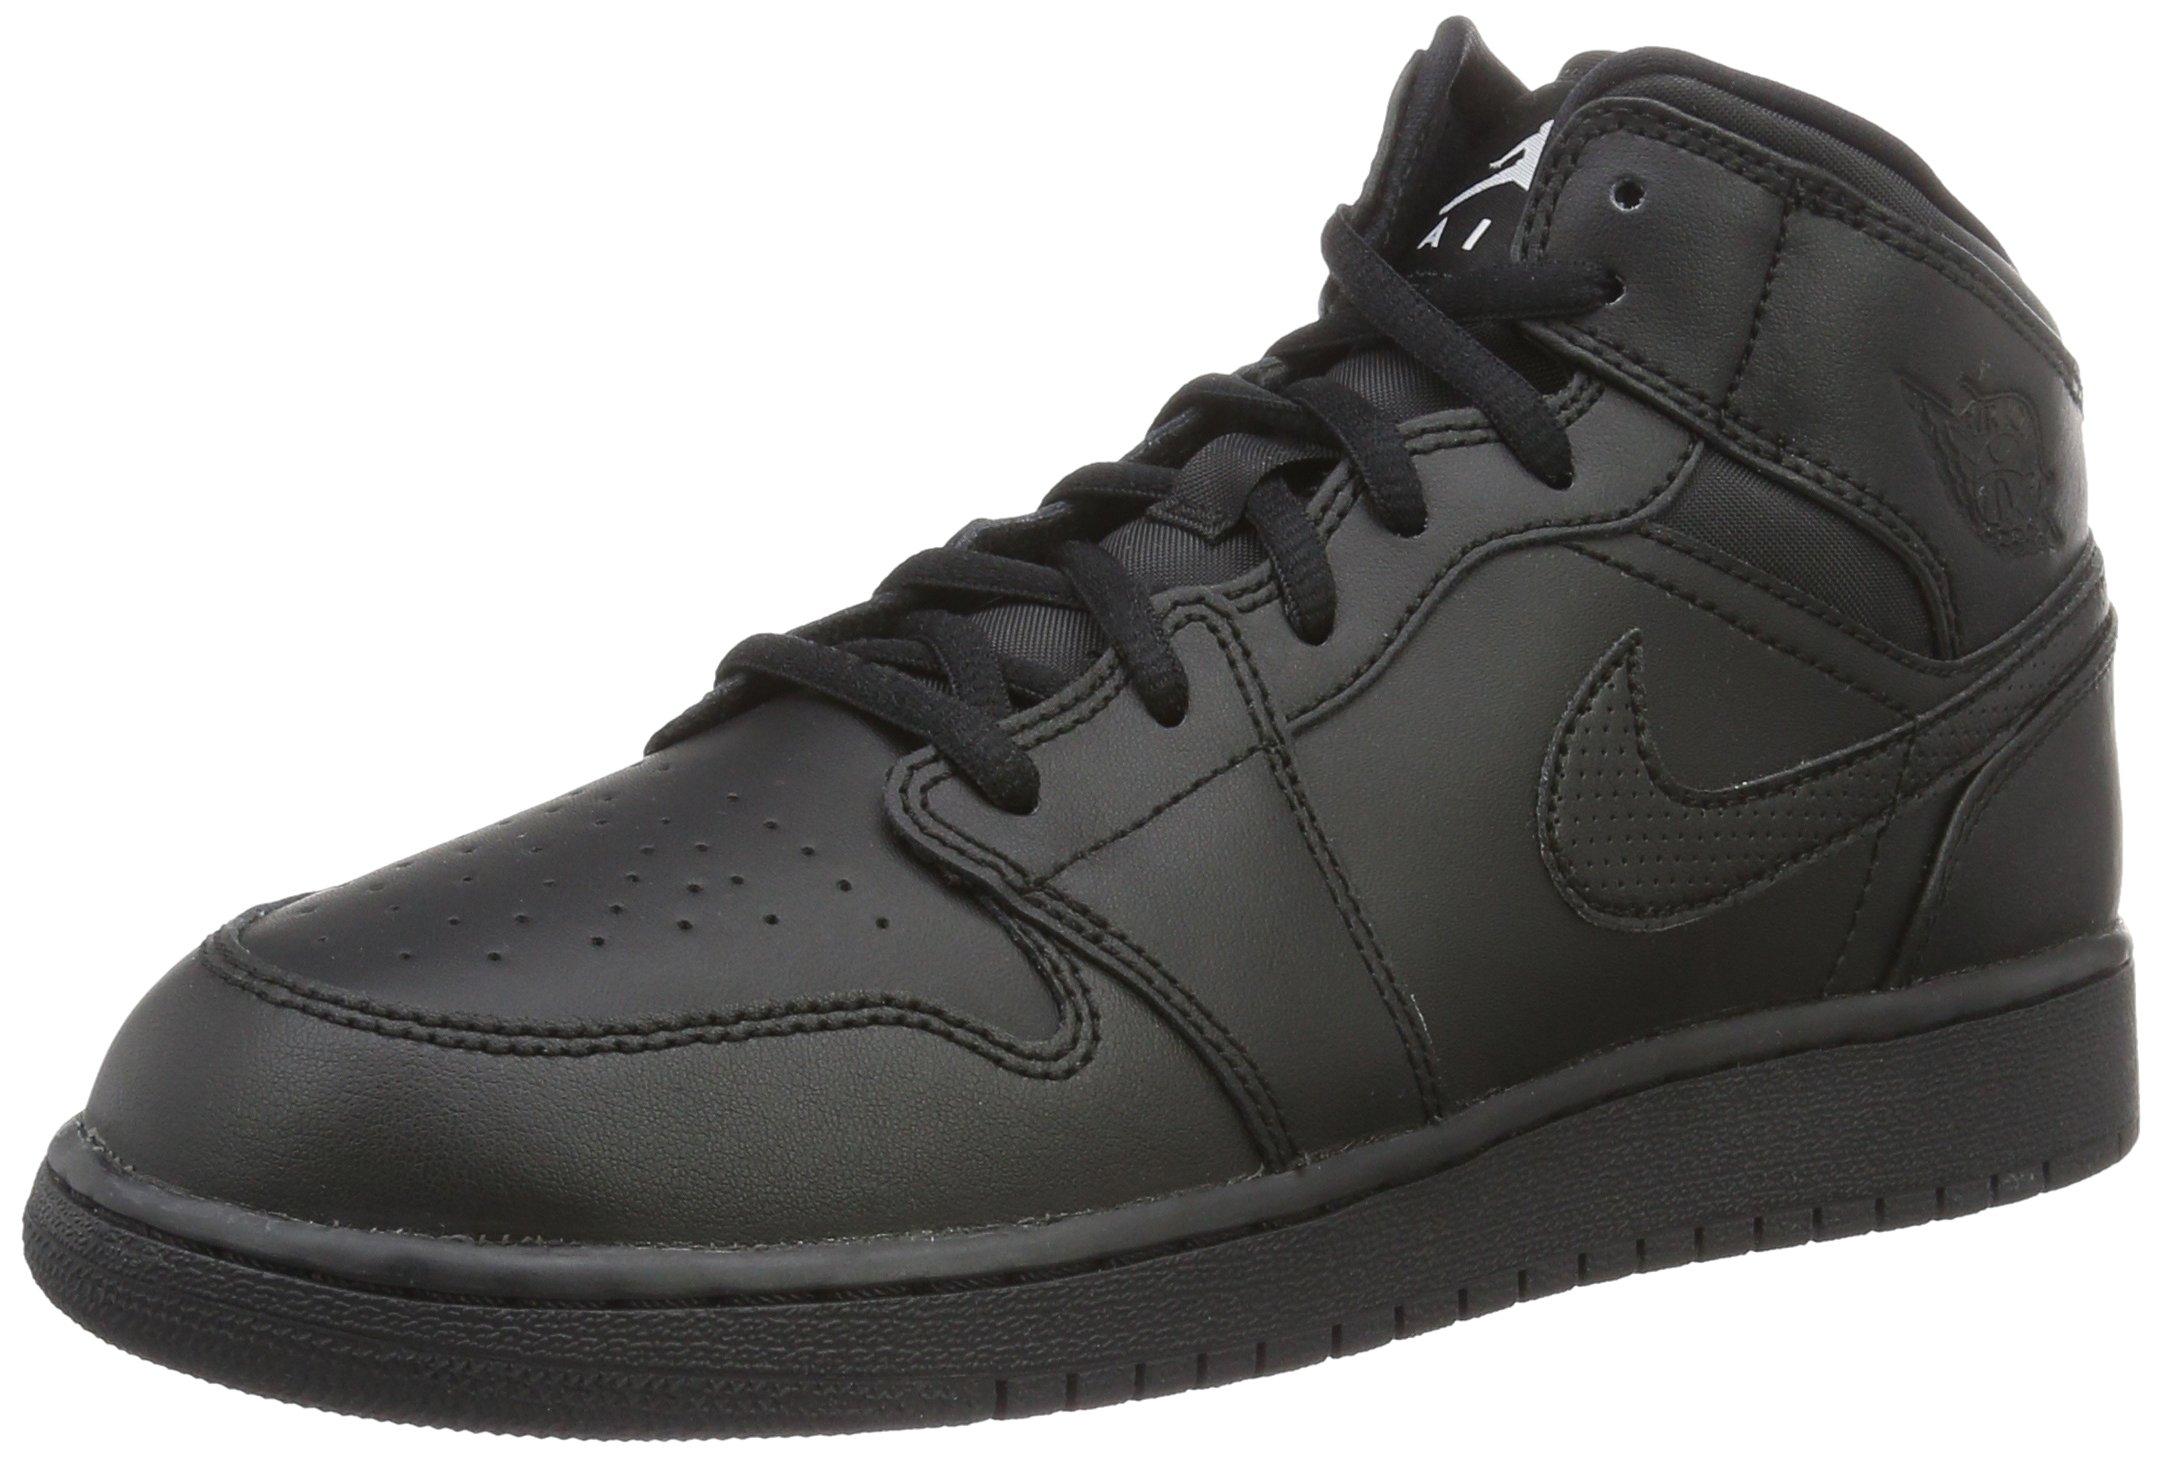 100% high quality nice shoes casual shoes NIKE Air Jordan 1 Mid BG Sneaker All Black, EU Shoe Size:EUR 38.5